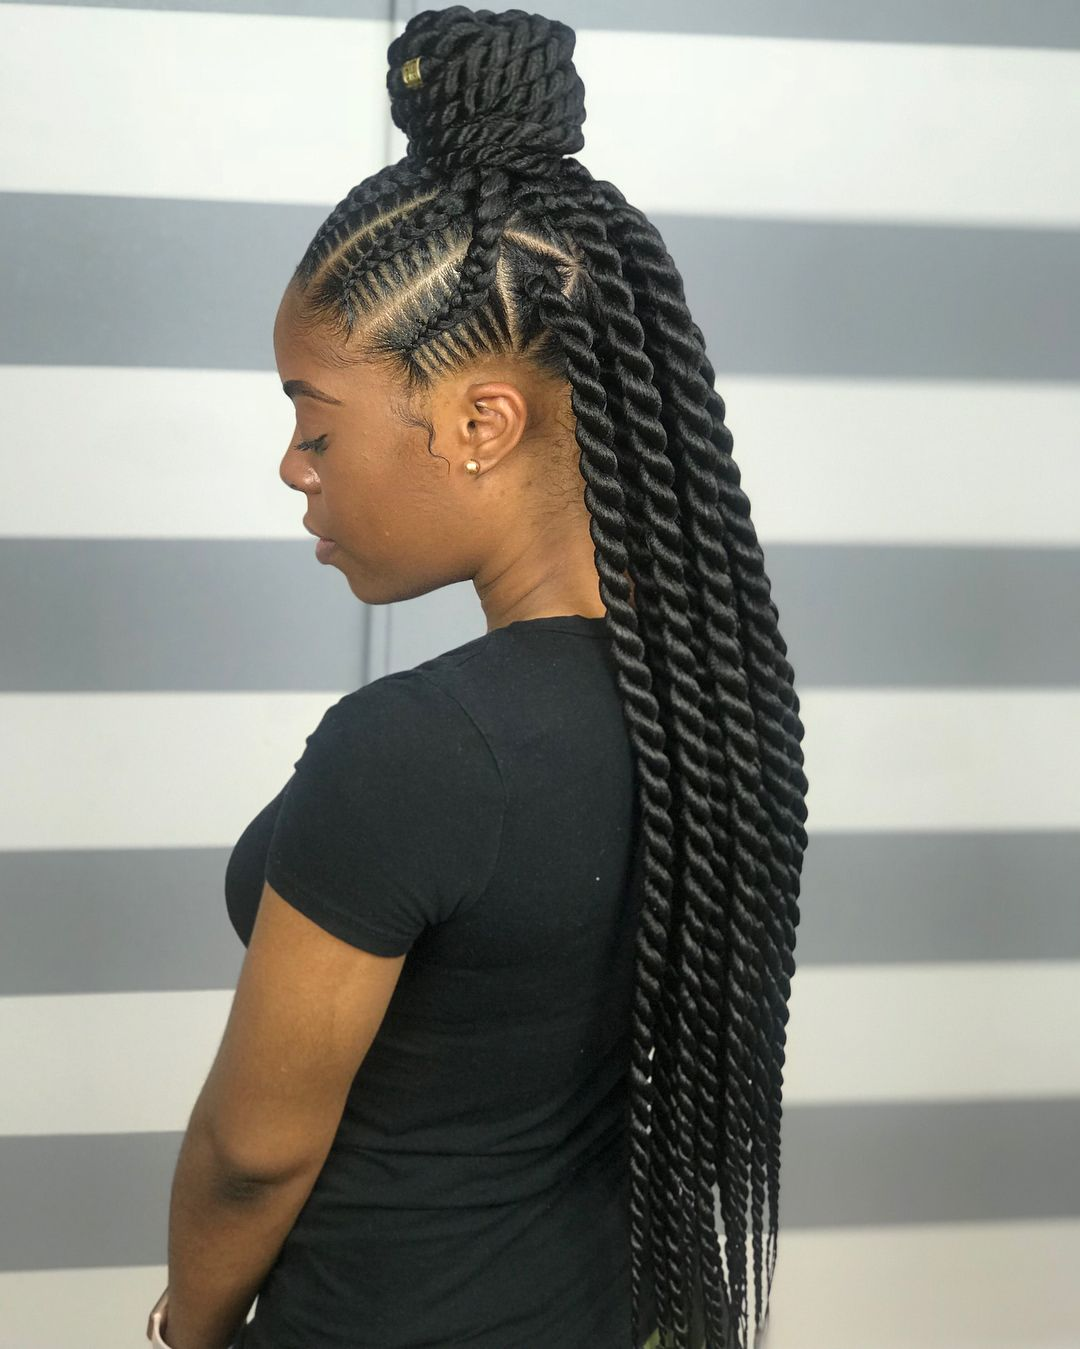 - Stitch Braids w/ Jumbo Senegalese TwistsPhoto Courtesy of Pinterest